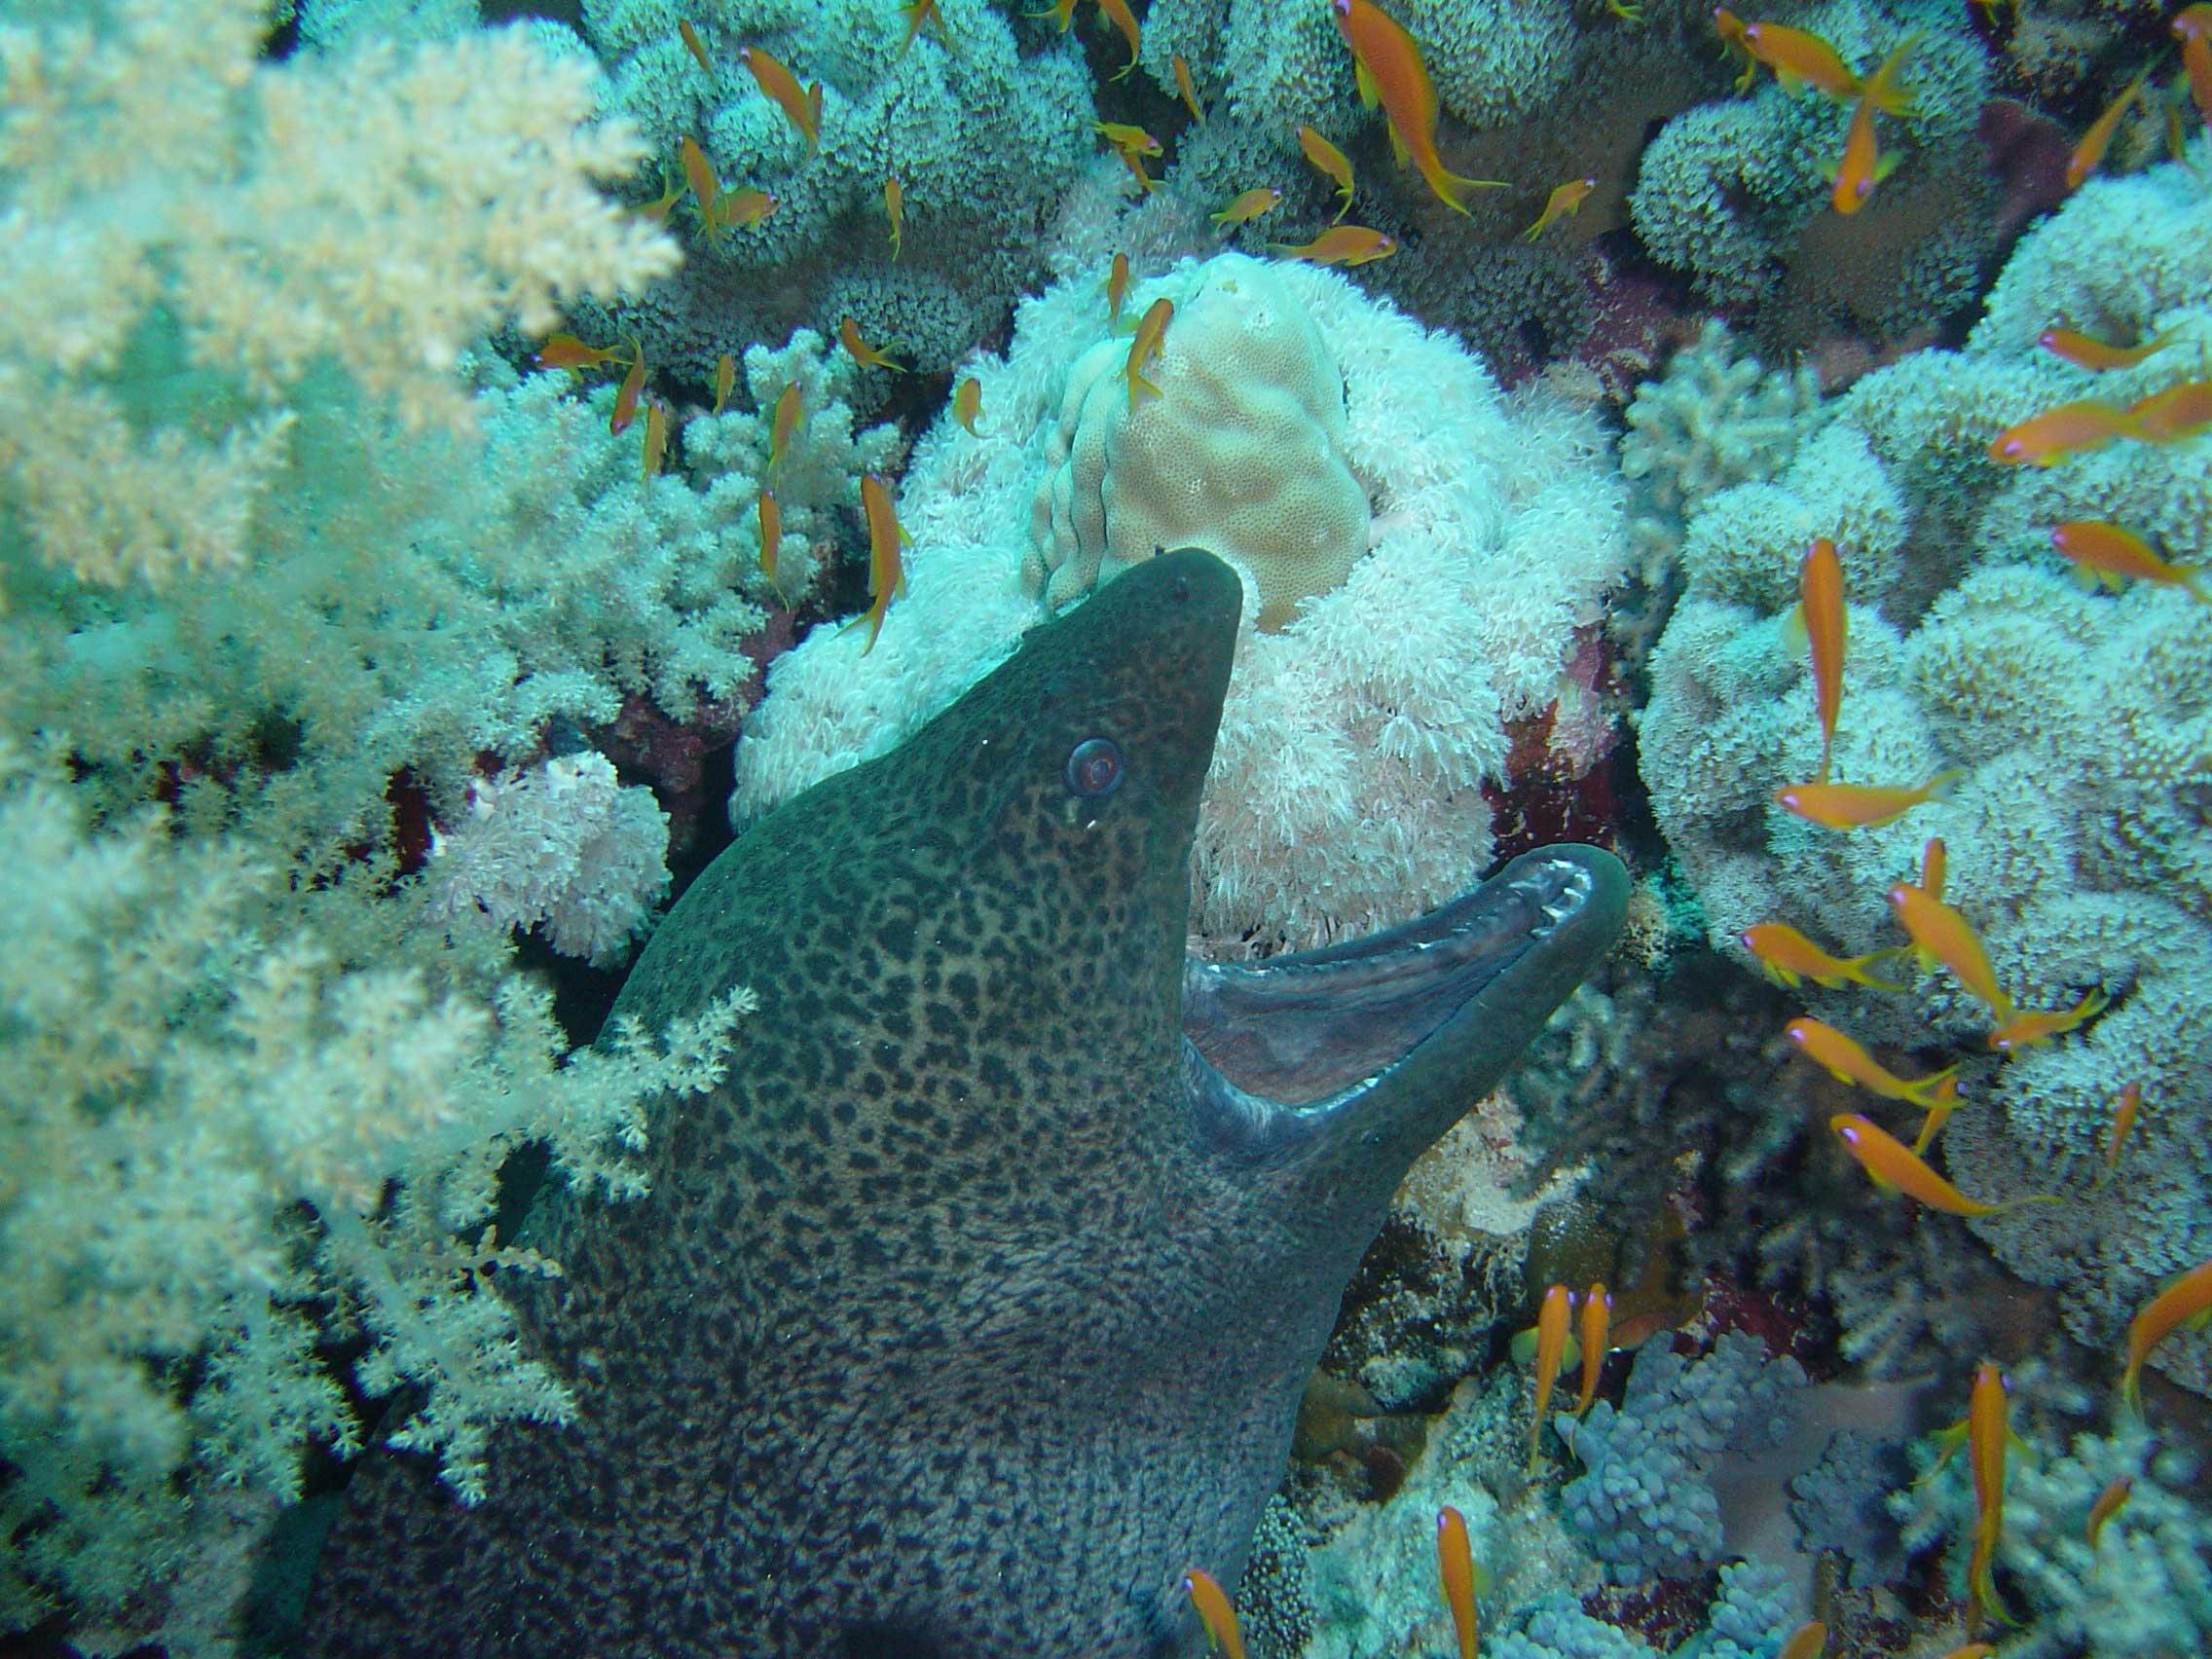 печень хорошо мурена фото красное море устанавливают камеру